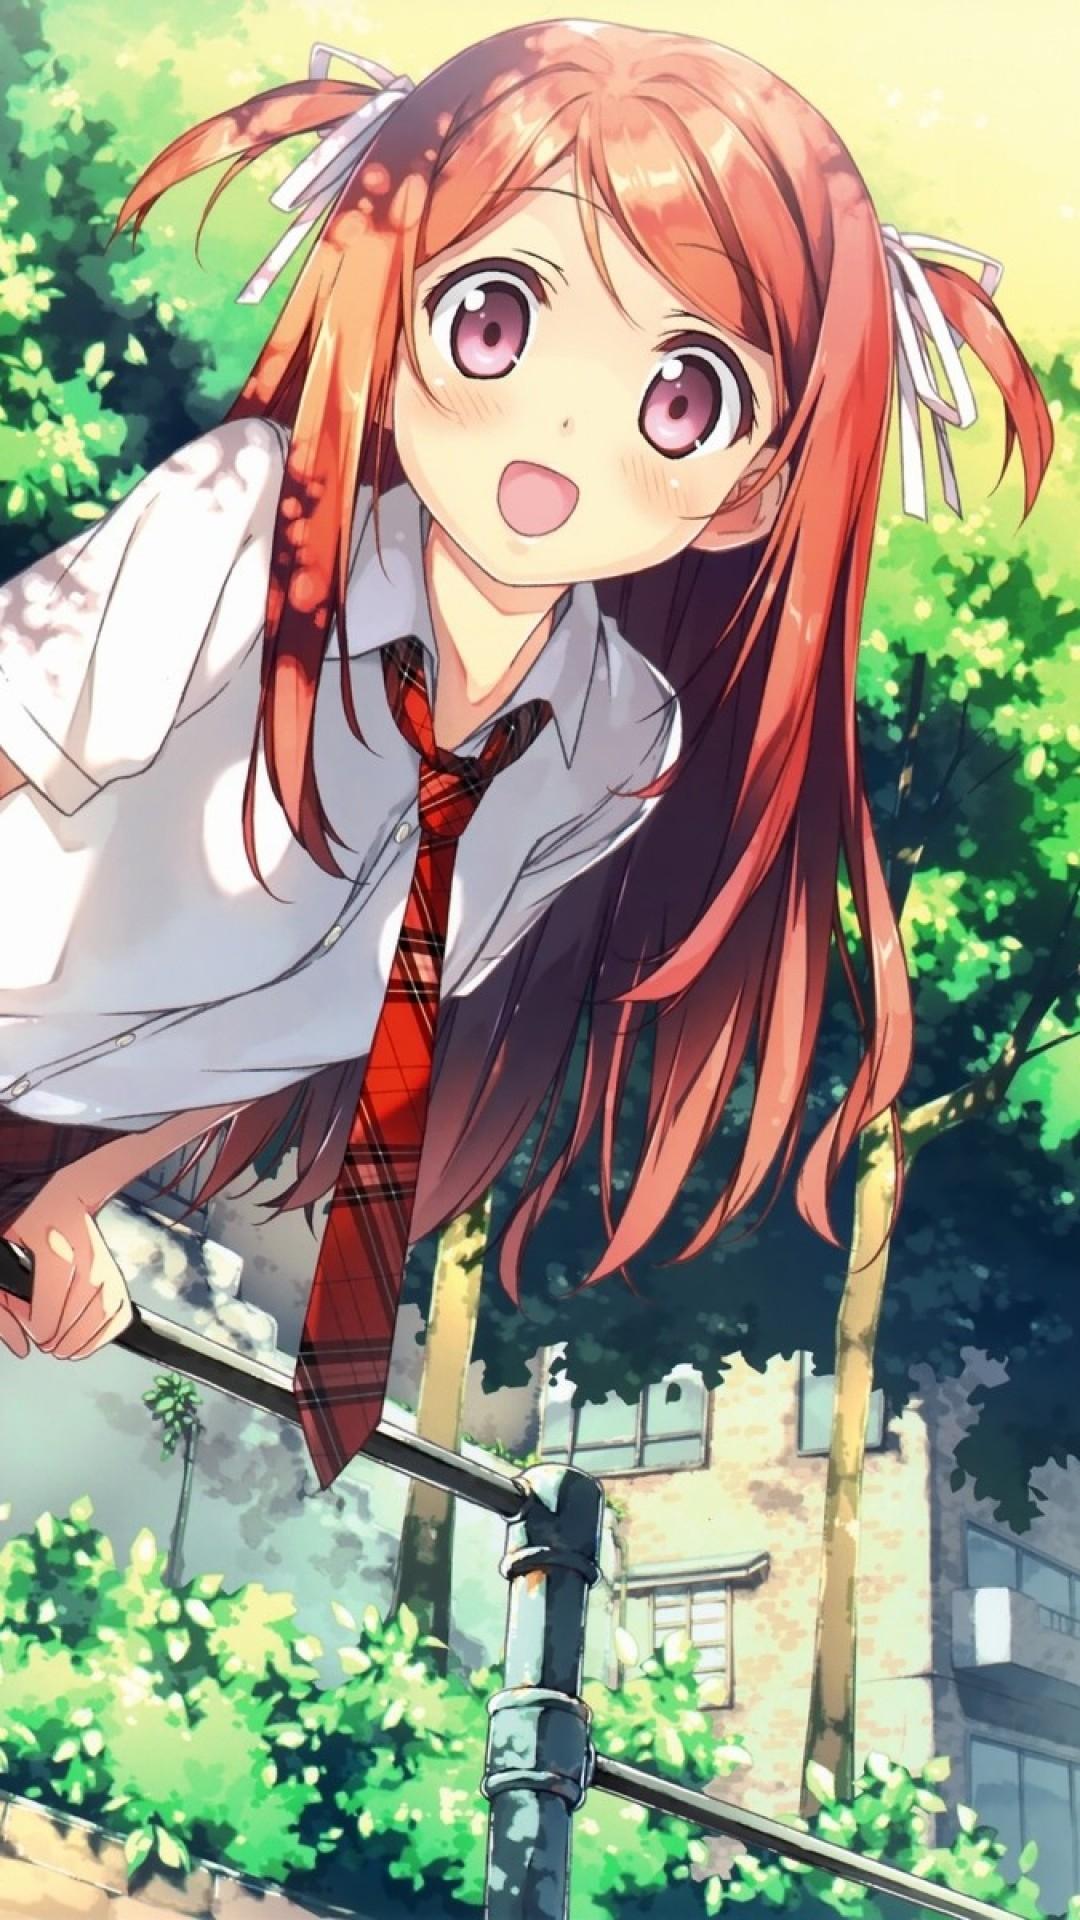 Wallpaper anime, girl, bag, horizontal bar, summer